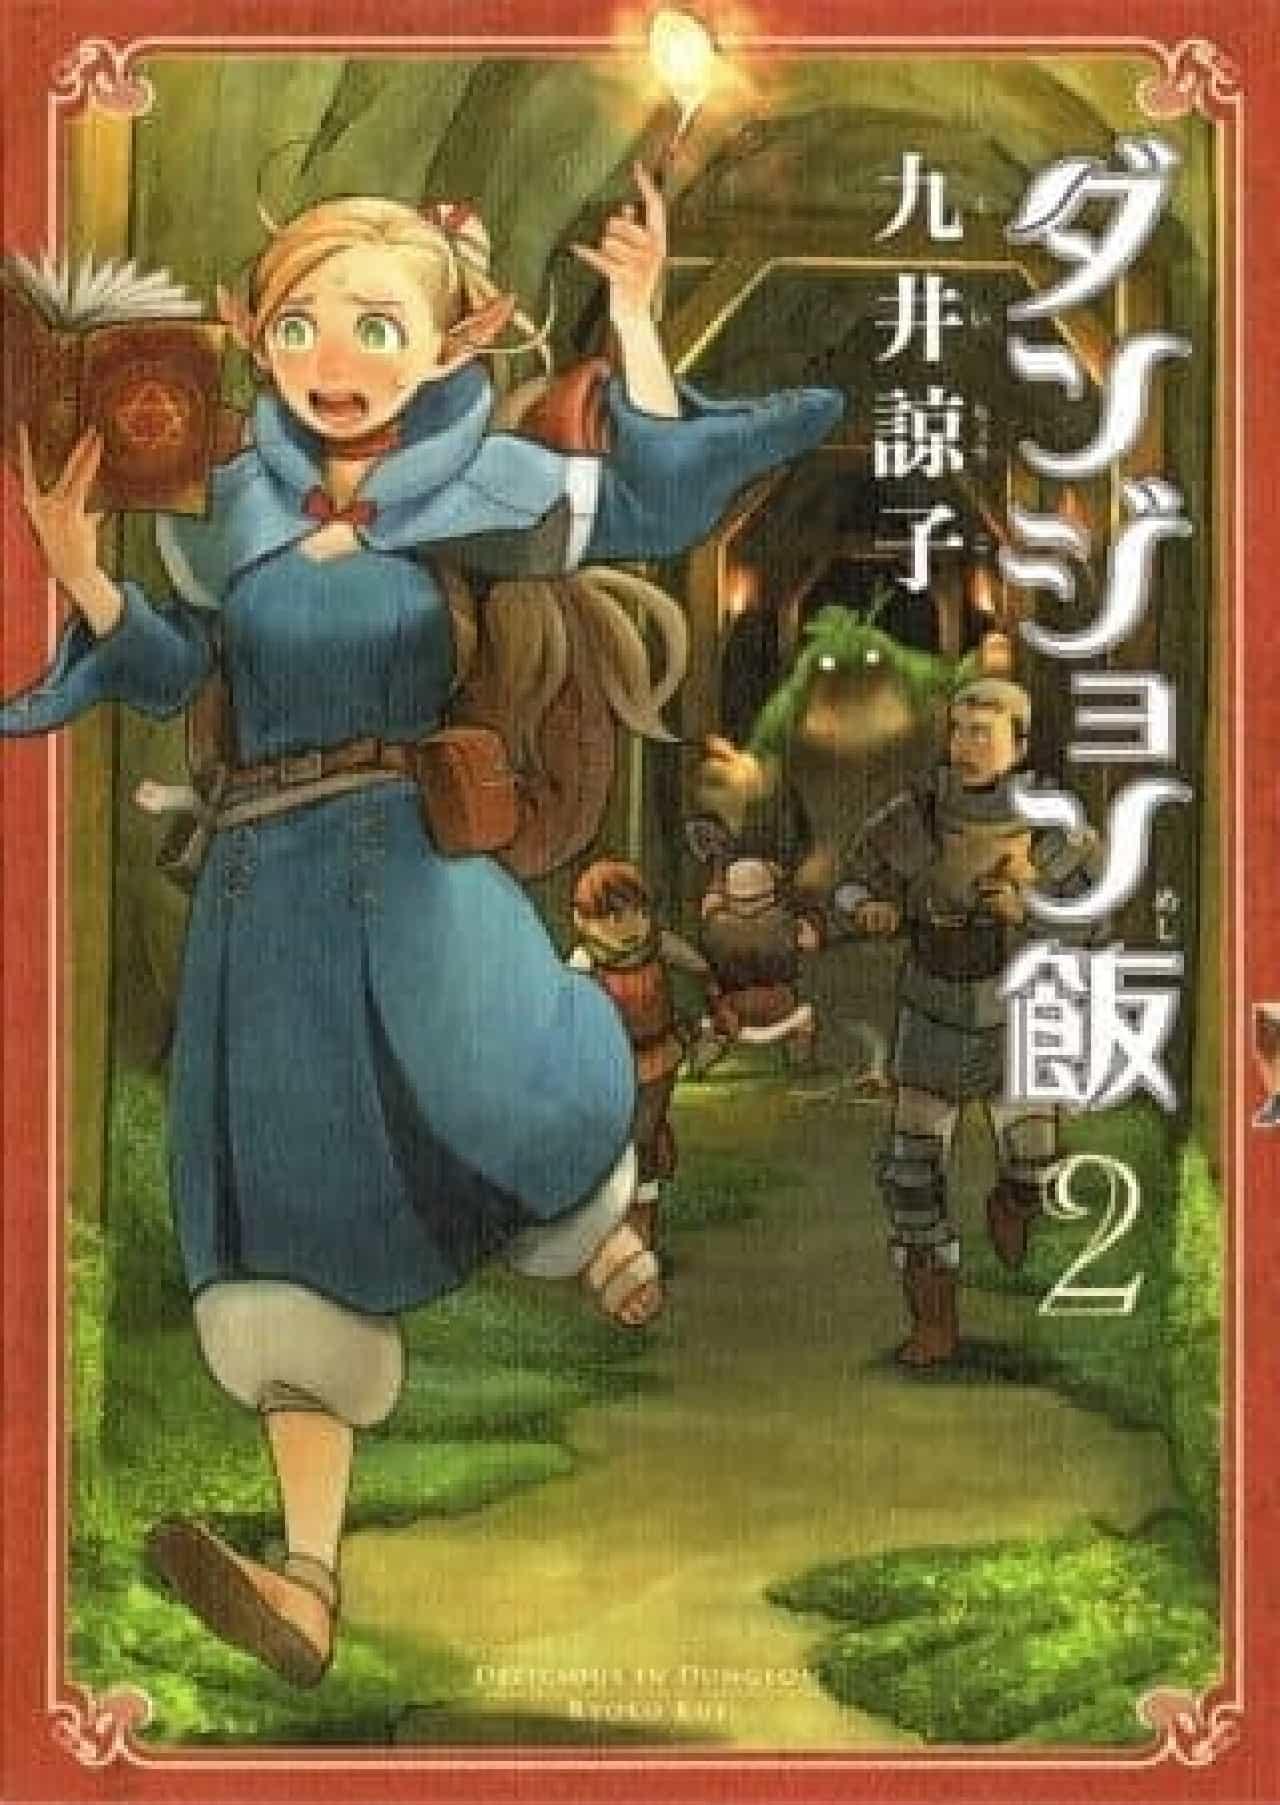 RPG世界の日常(?)が垣間見える  (c)九井諒子/KADOKAWA